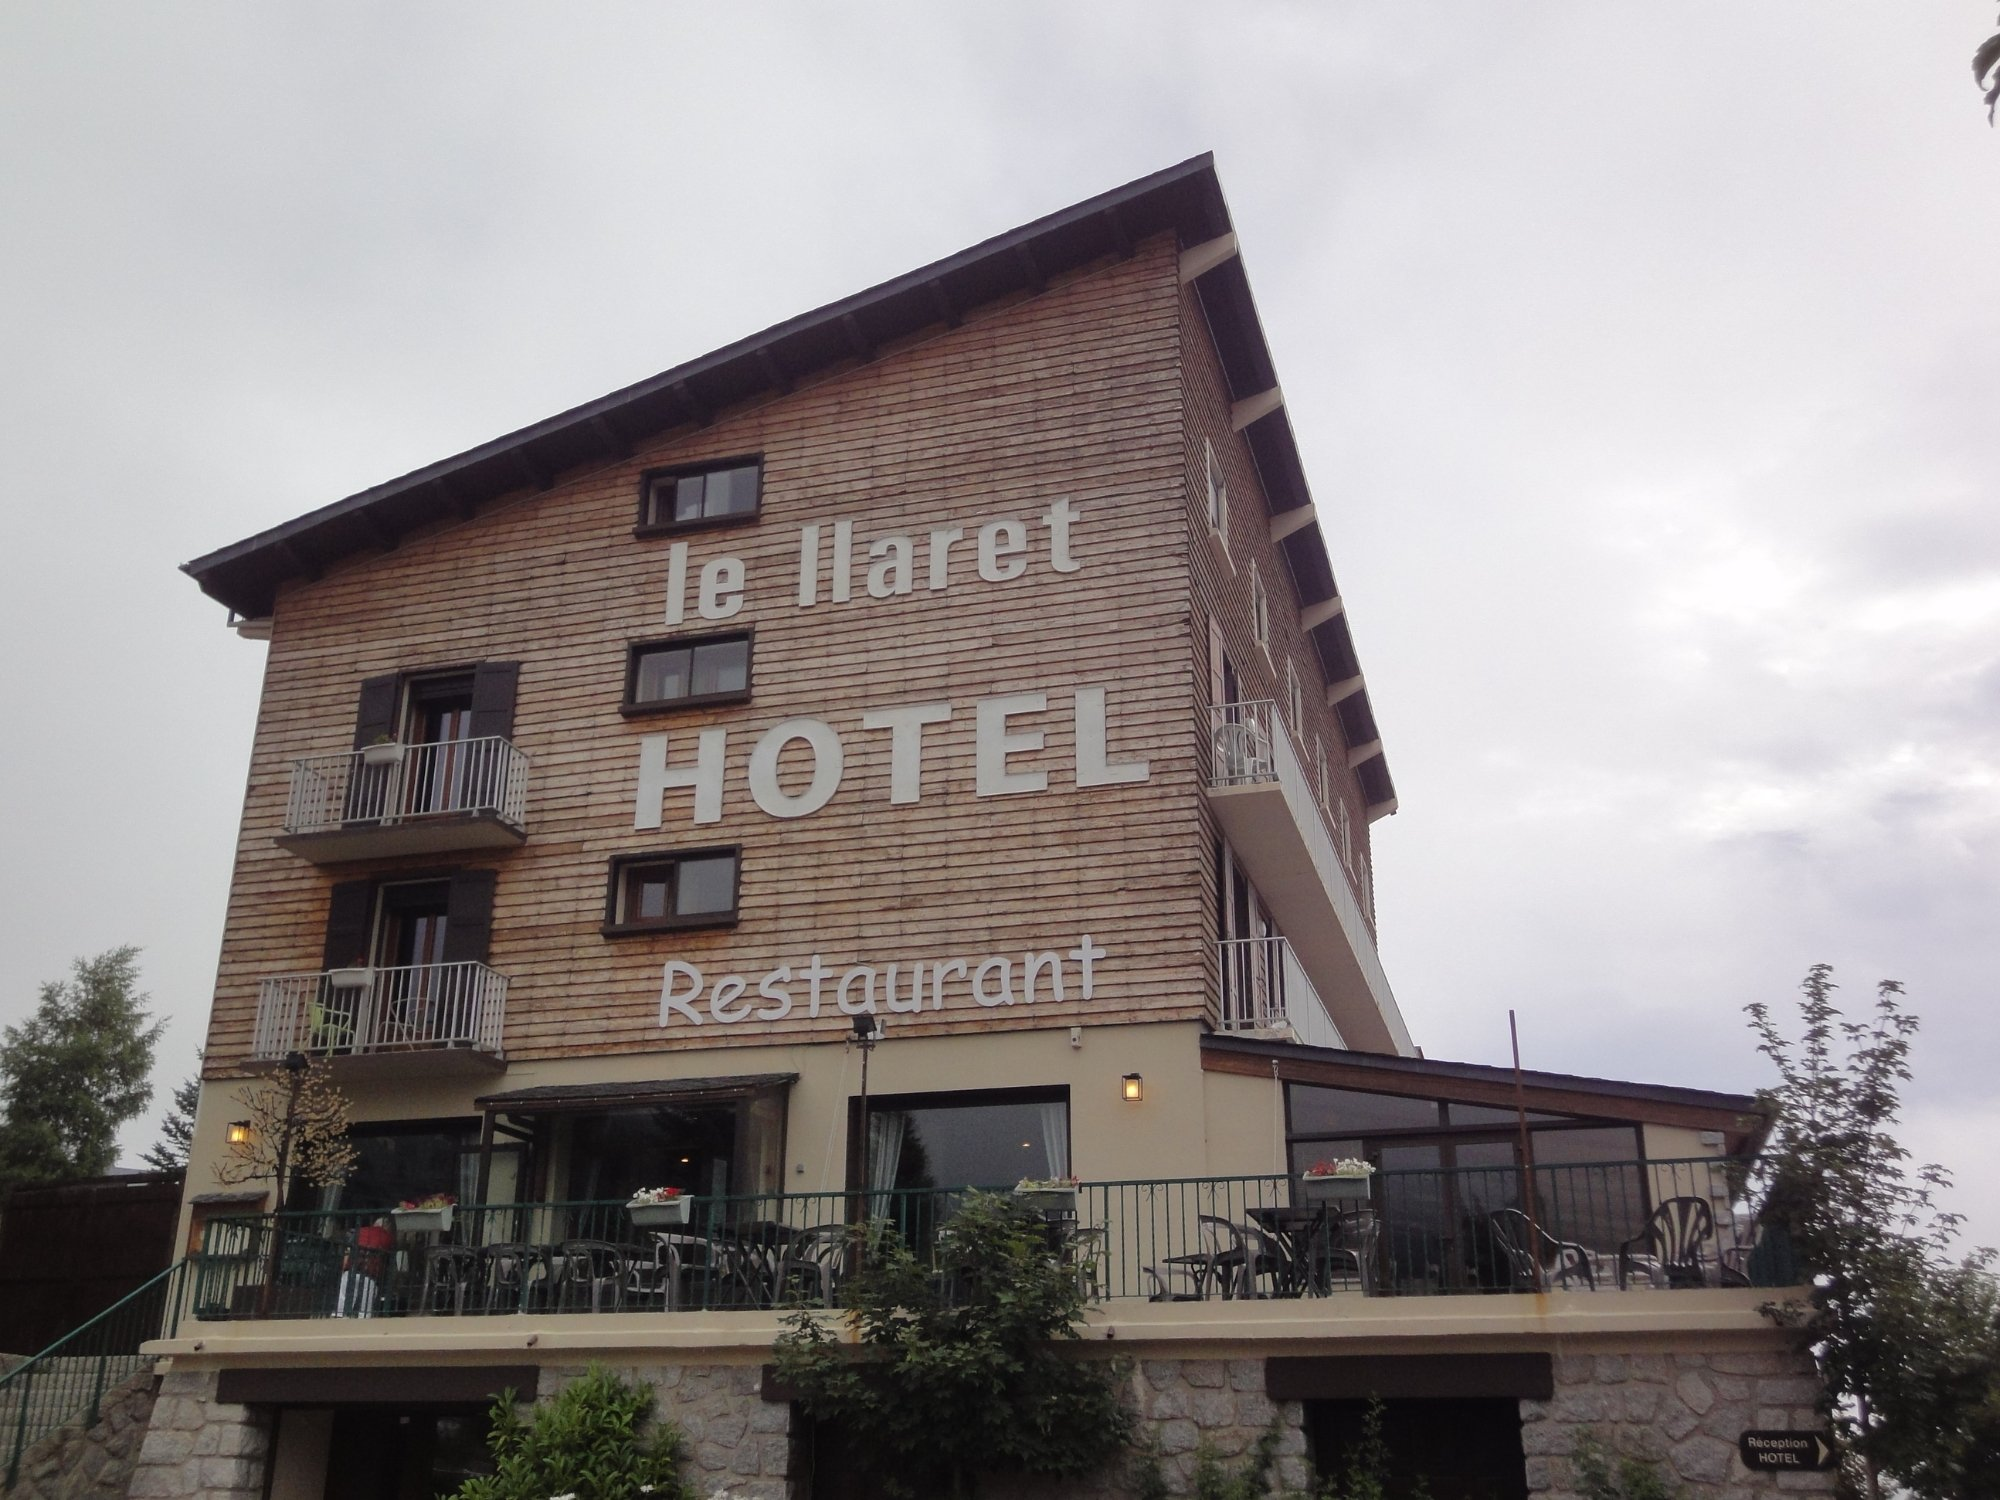 Llaret Hotel